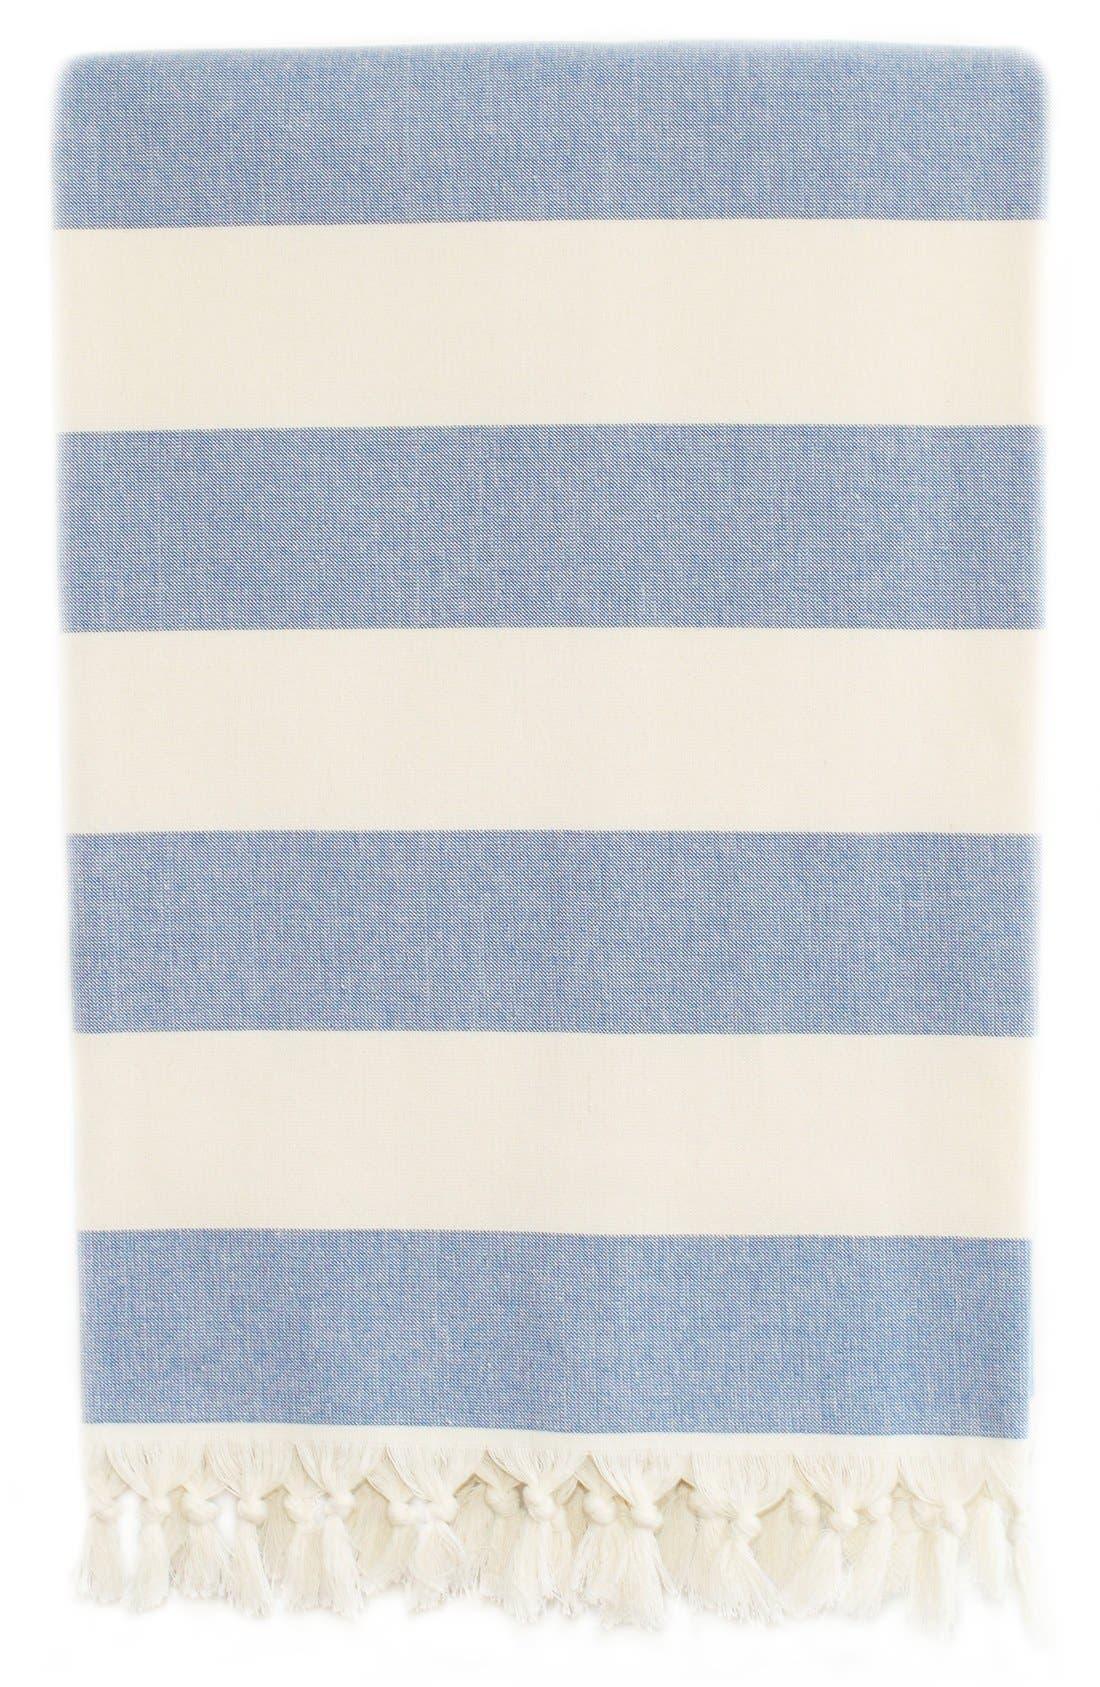 'Patara' Turkish Pestemal Towel,                             Alternate thumbnail 2, color,                             ROYAL BLUE